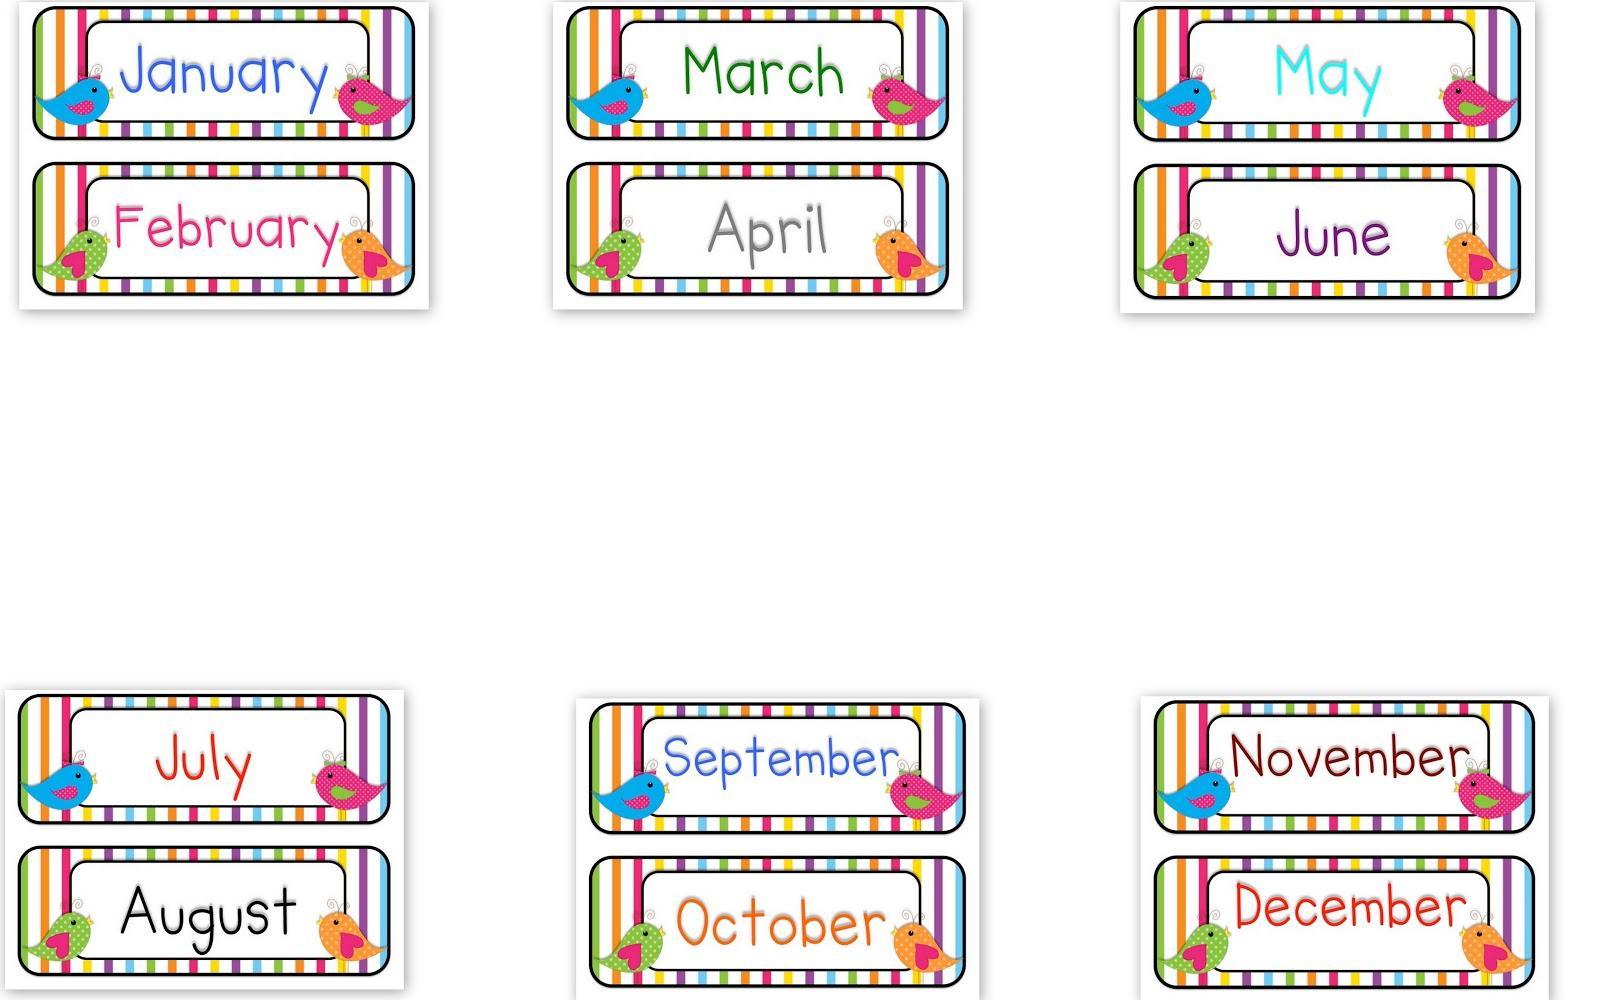 Preschool Months Of The Year Worksheets For Kindergarten